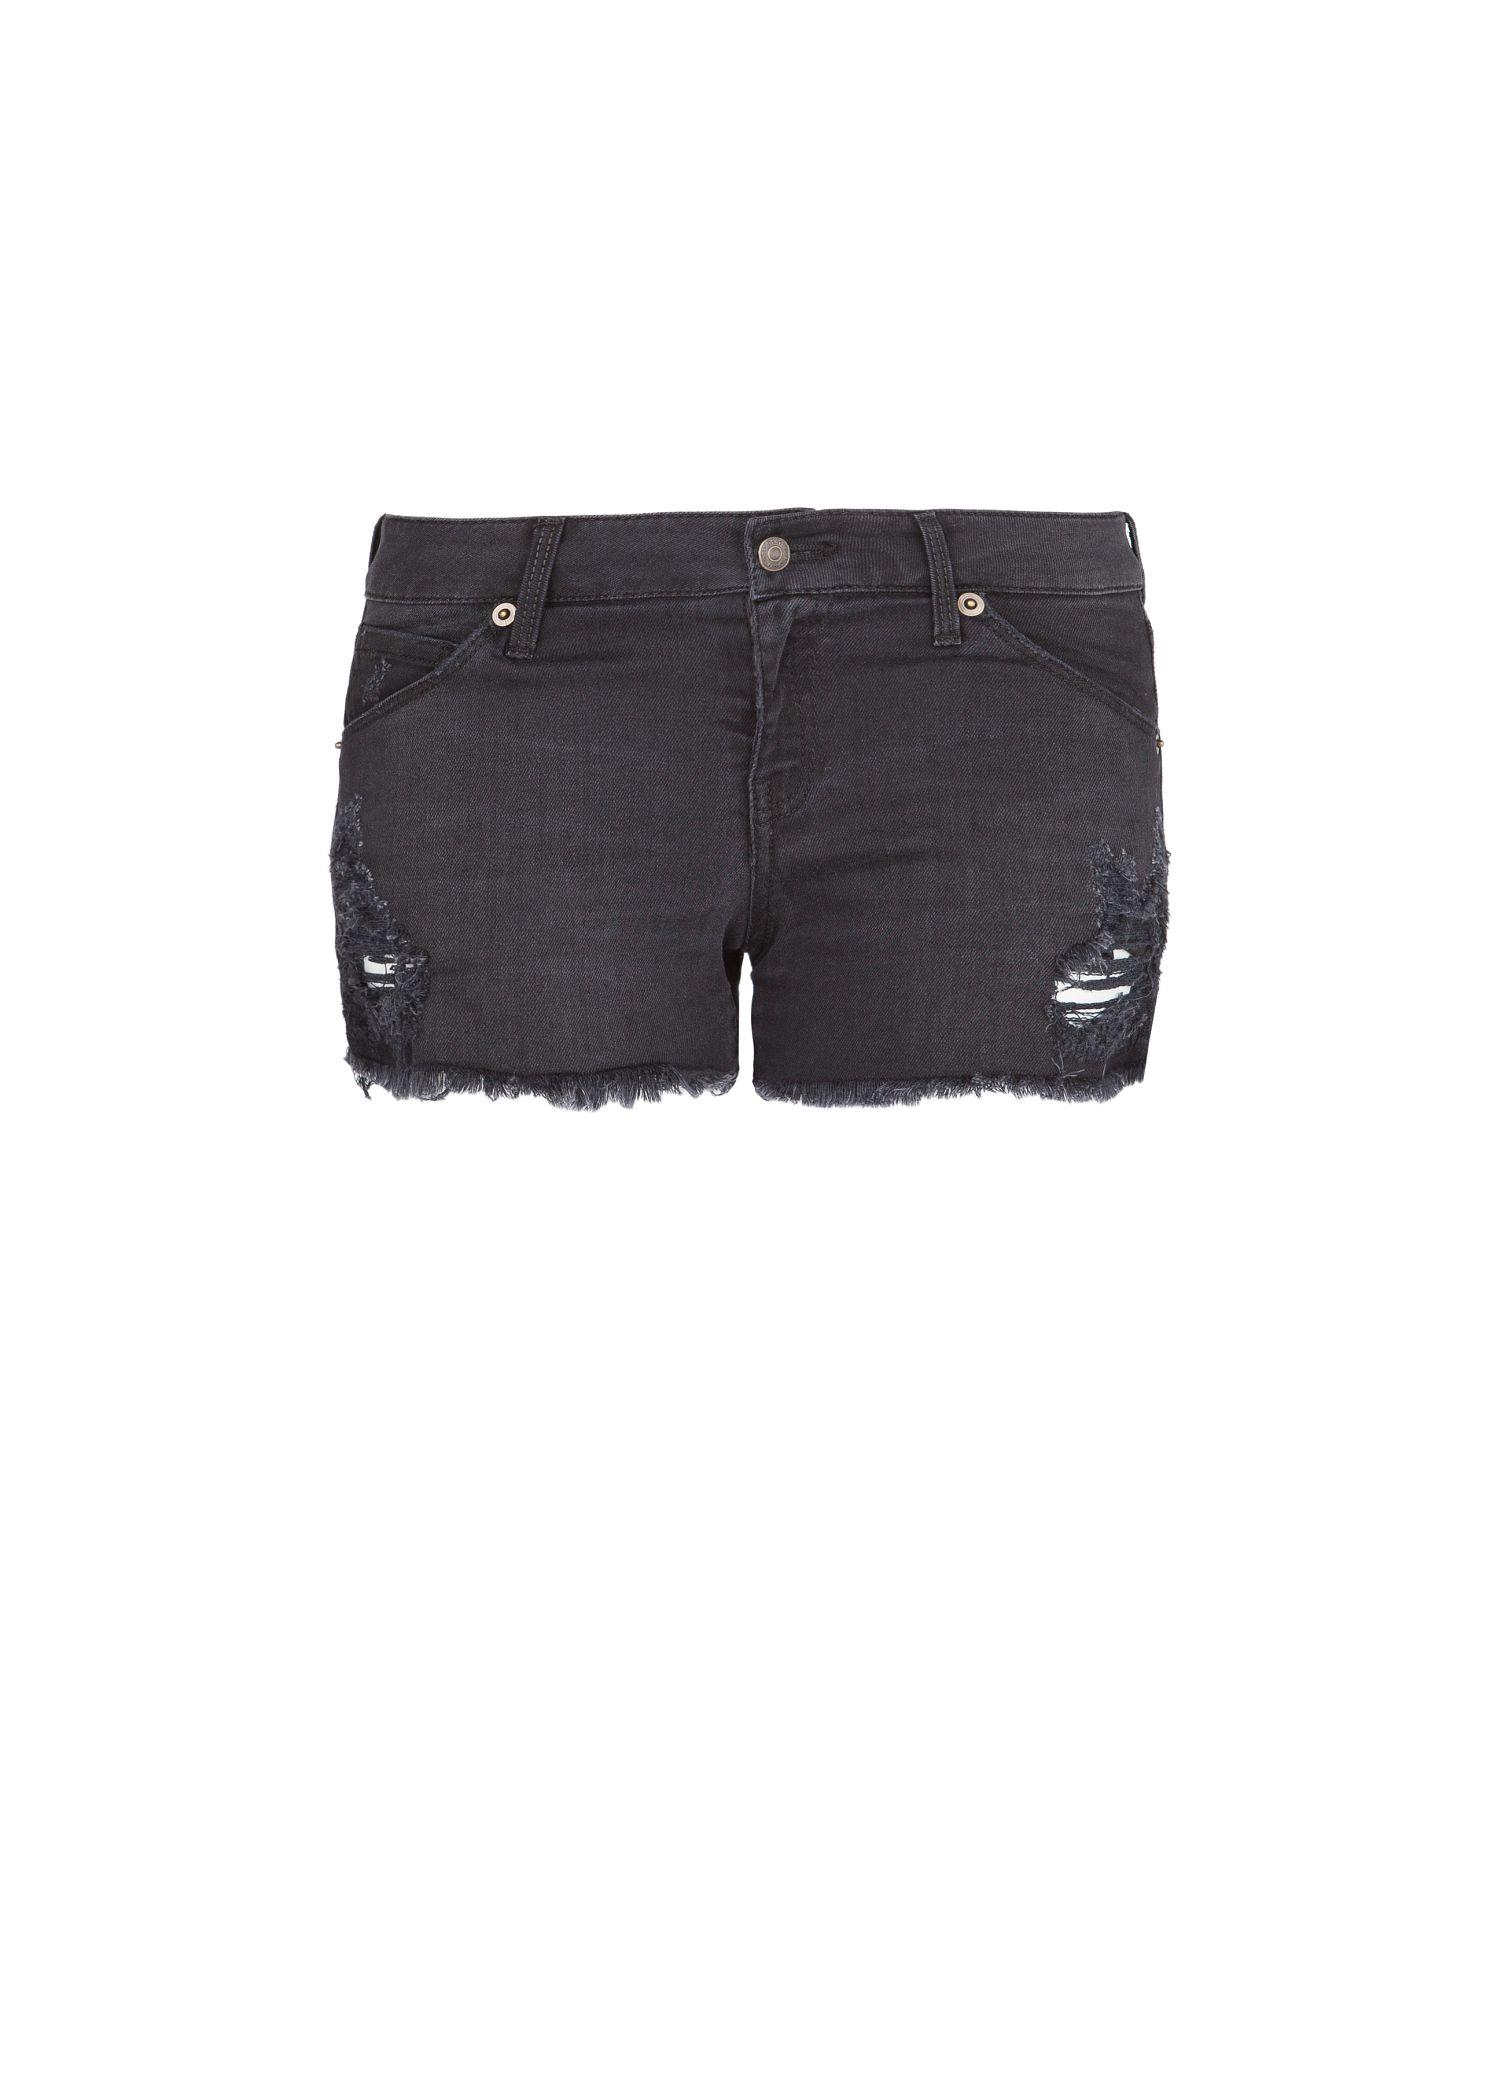 Mango Ripped Black Denim Shorts in Black | Lyst